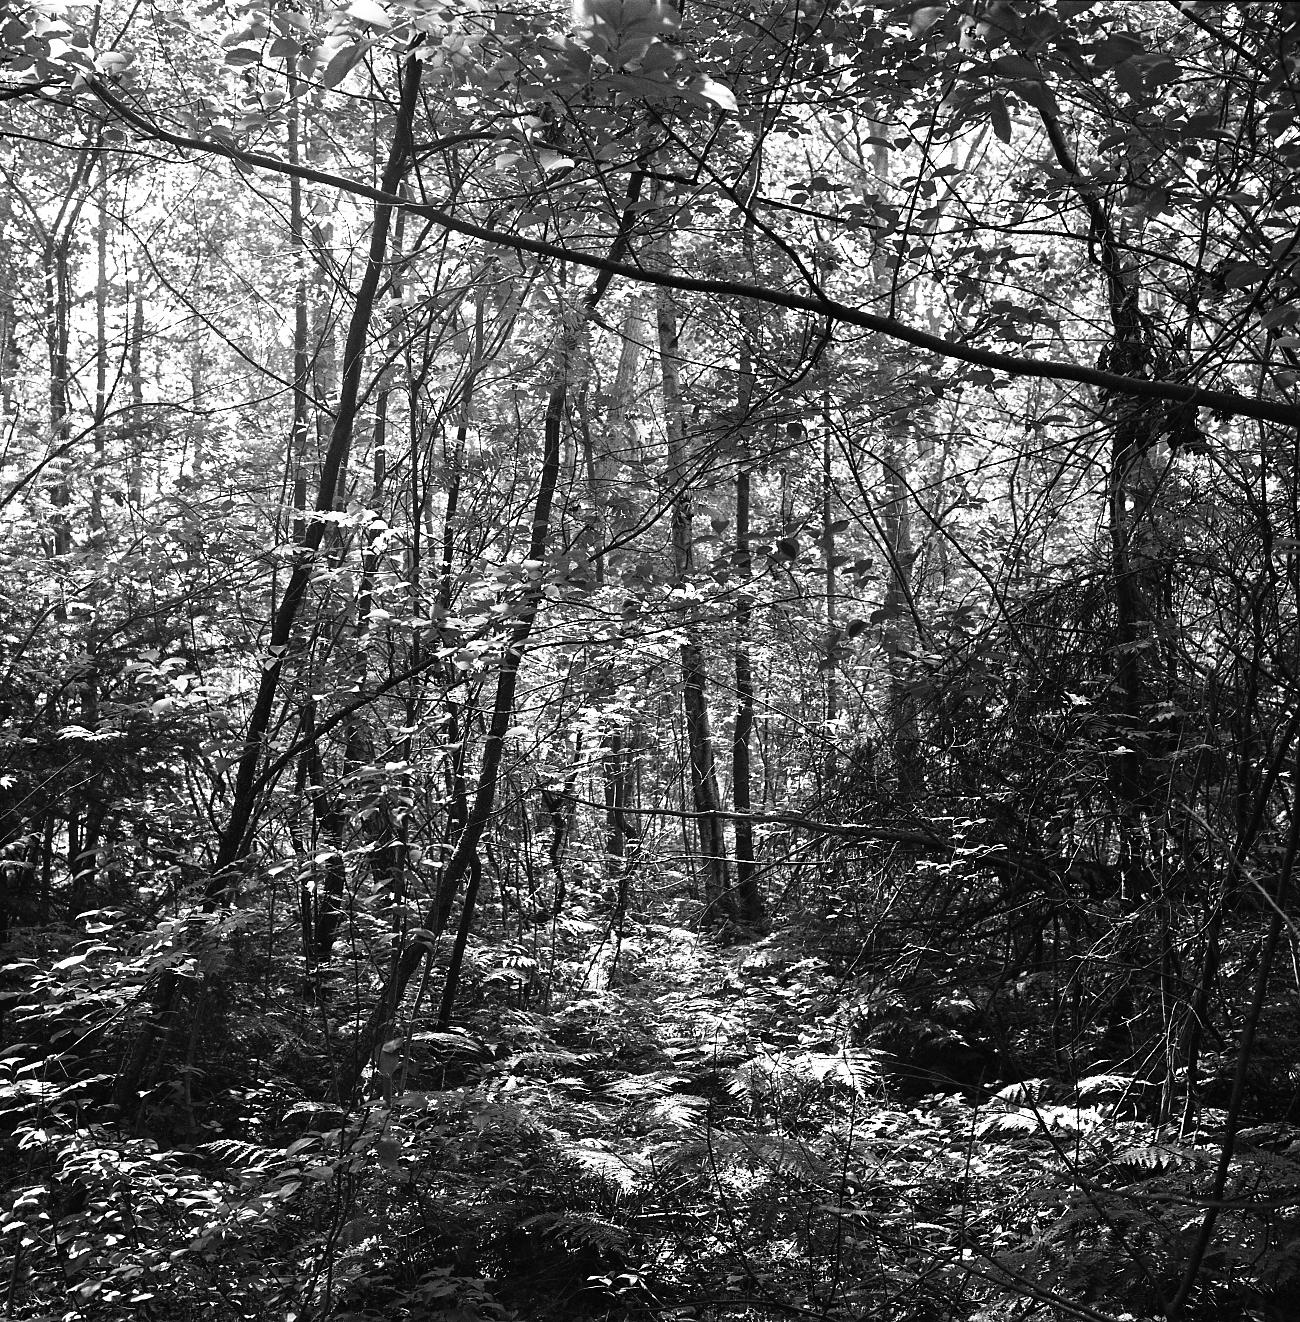 Elfland forest, Vlieland